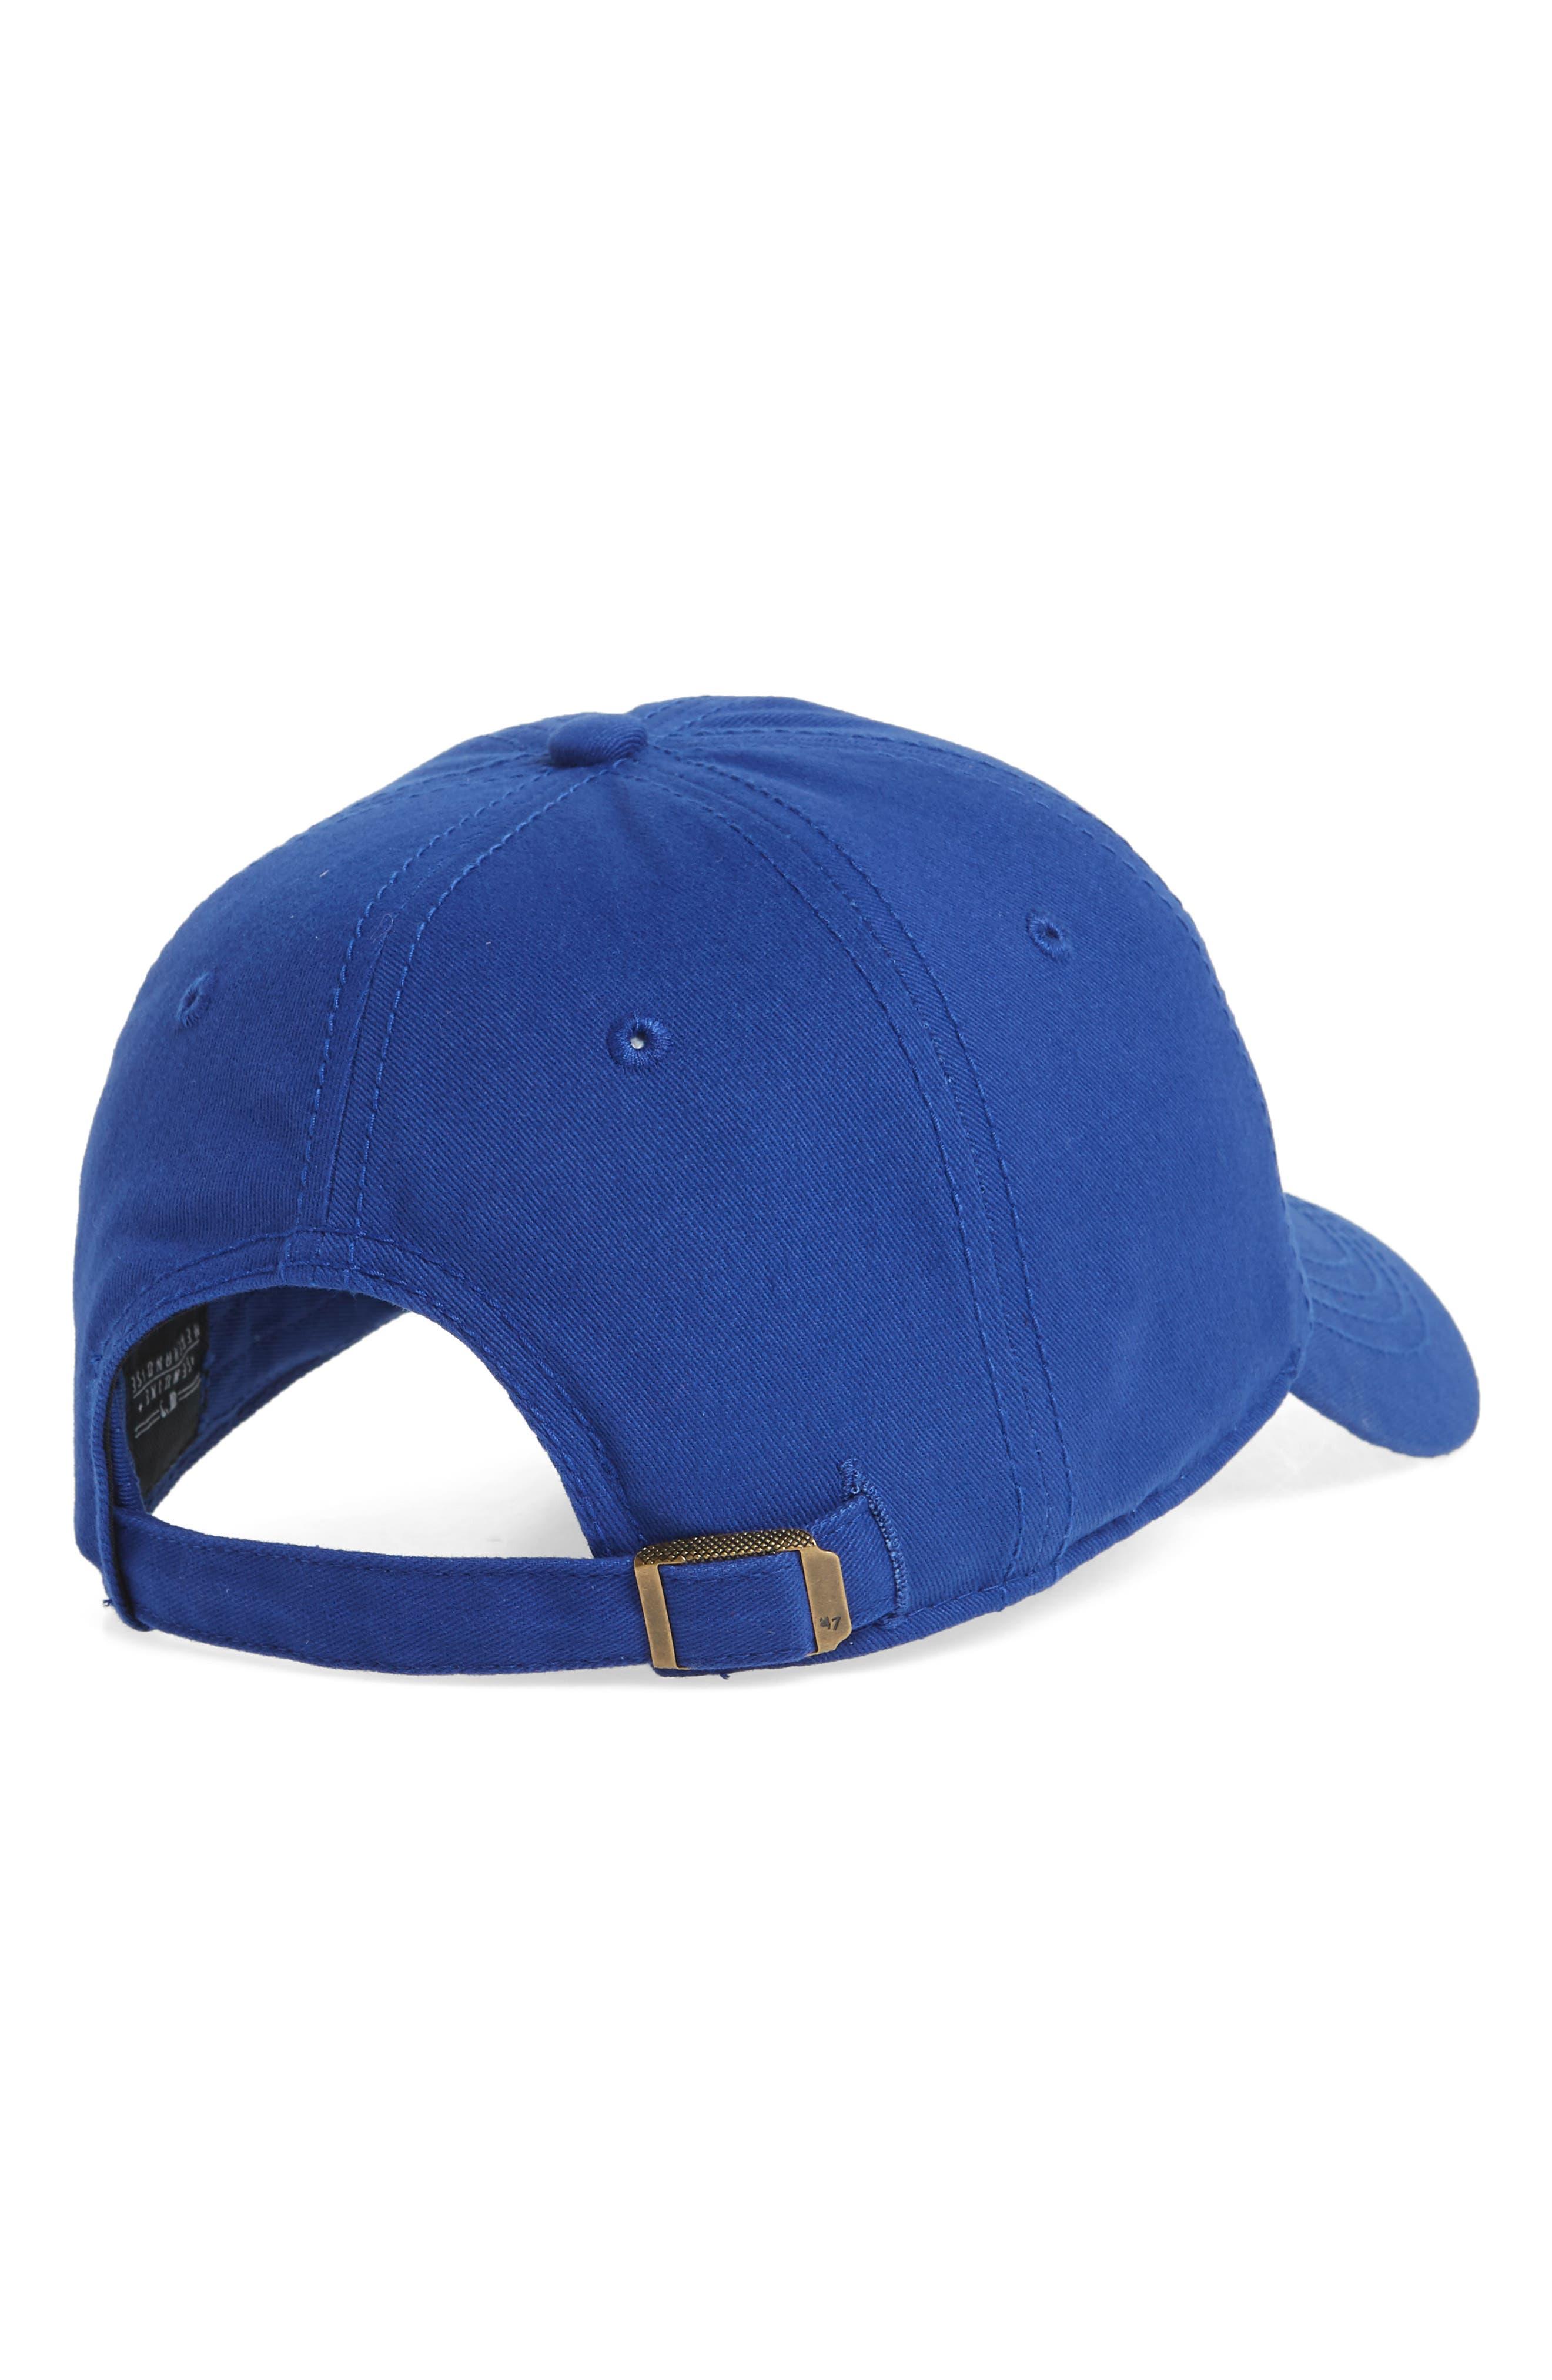 Miata Clean-Up Texas Rangers Baseball Cap,                             Alternate thumbnail 2, color,                             Royal